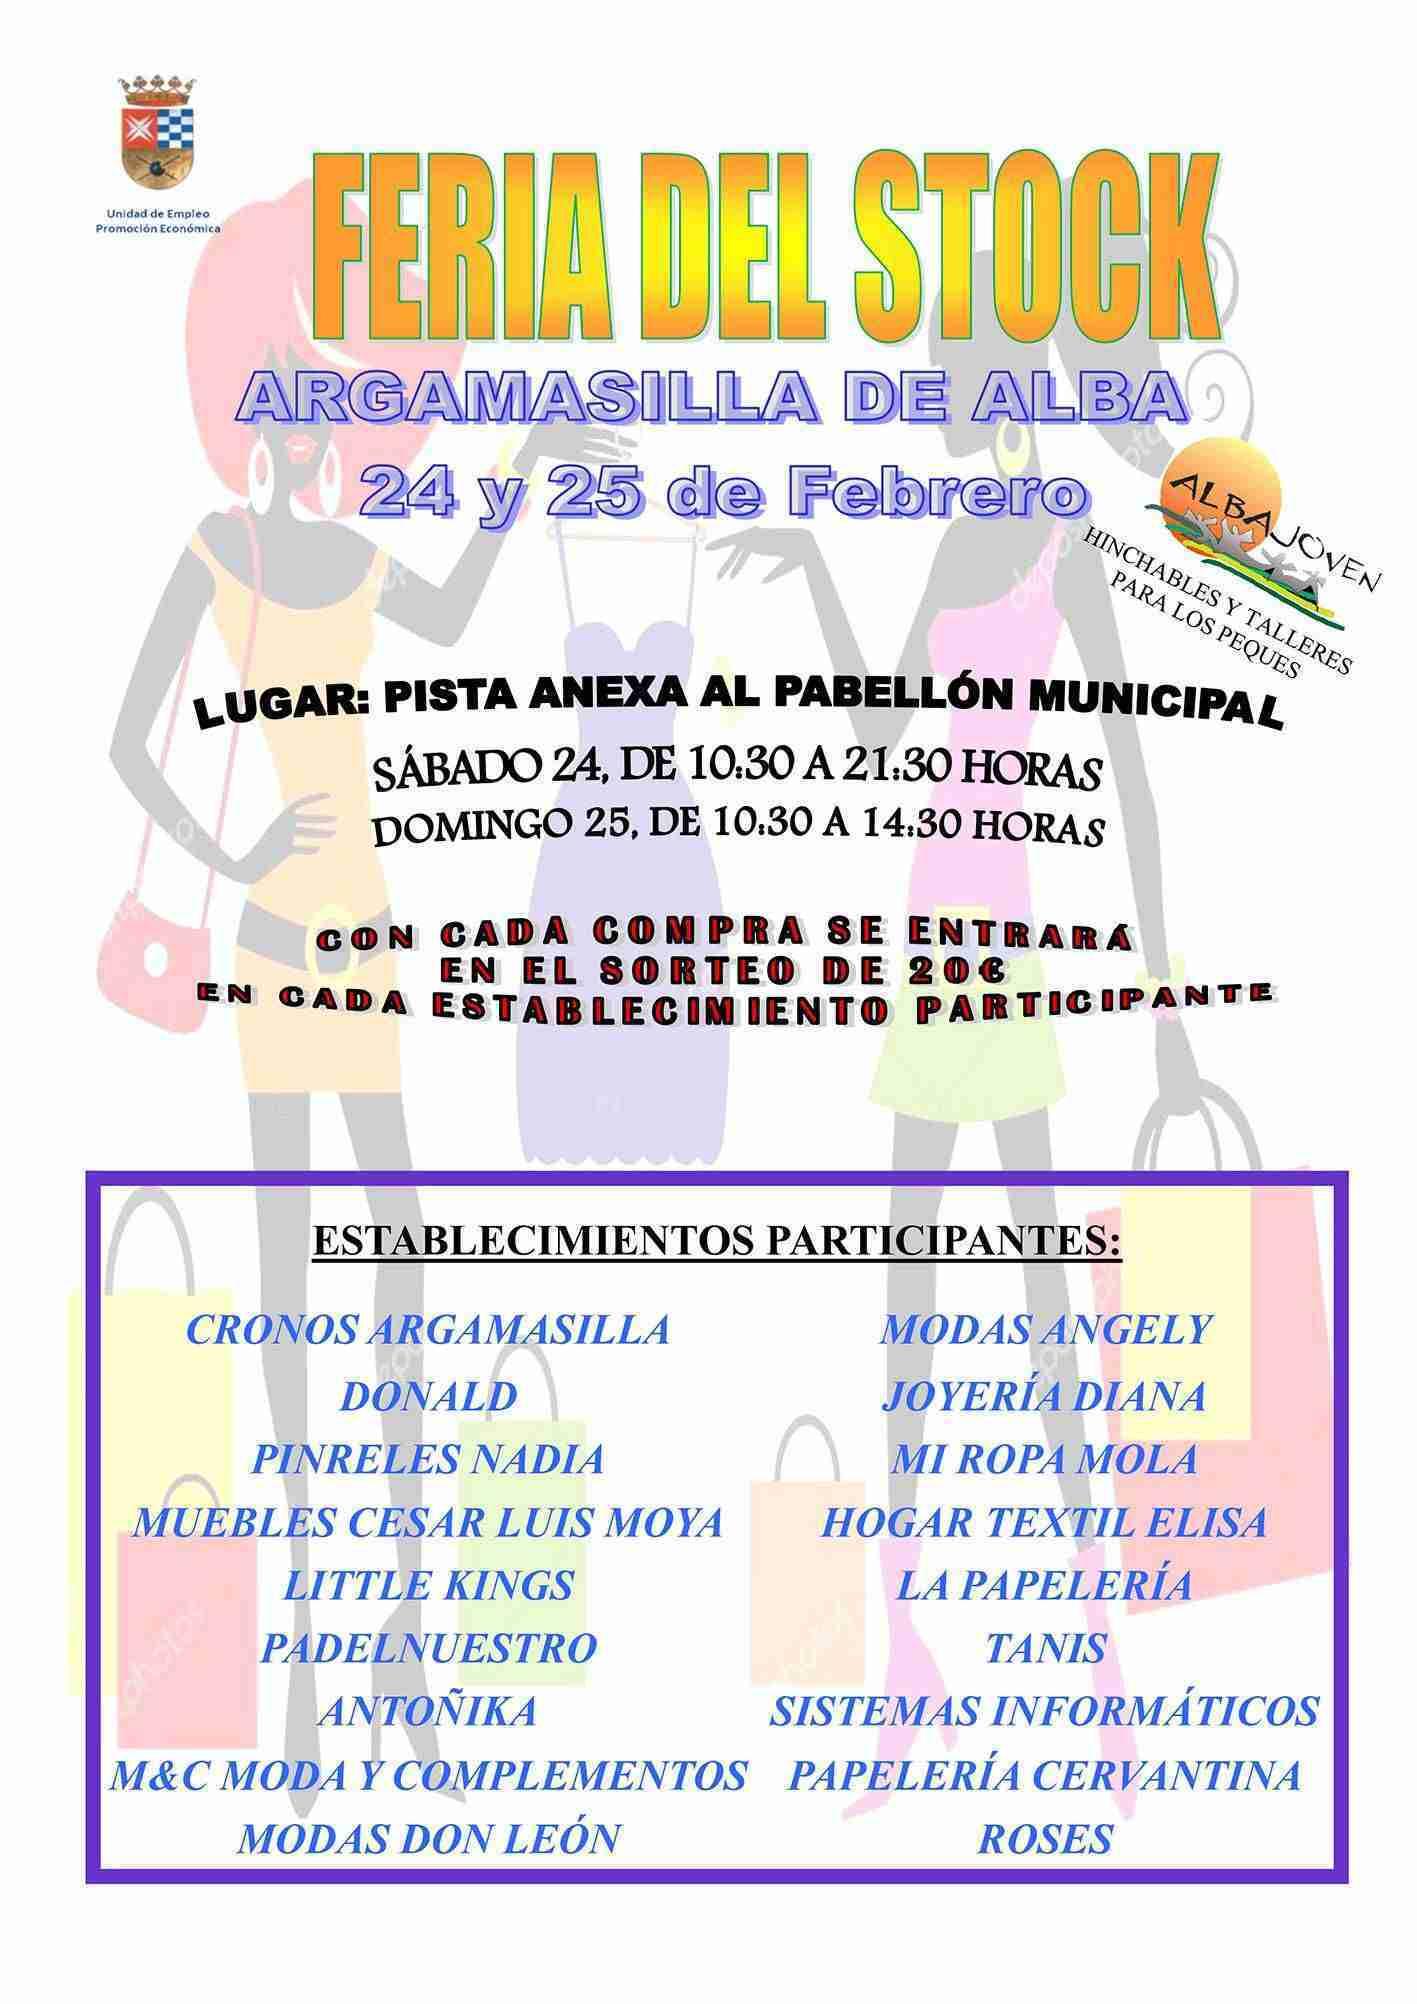 Feria del stock de Argamasilla de Alba 3